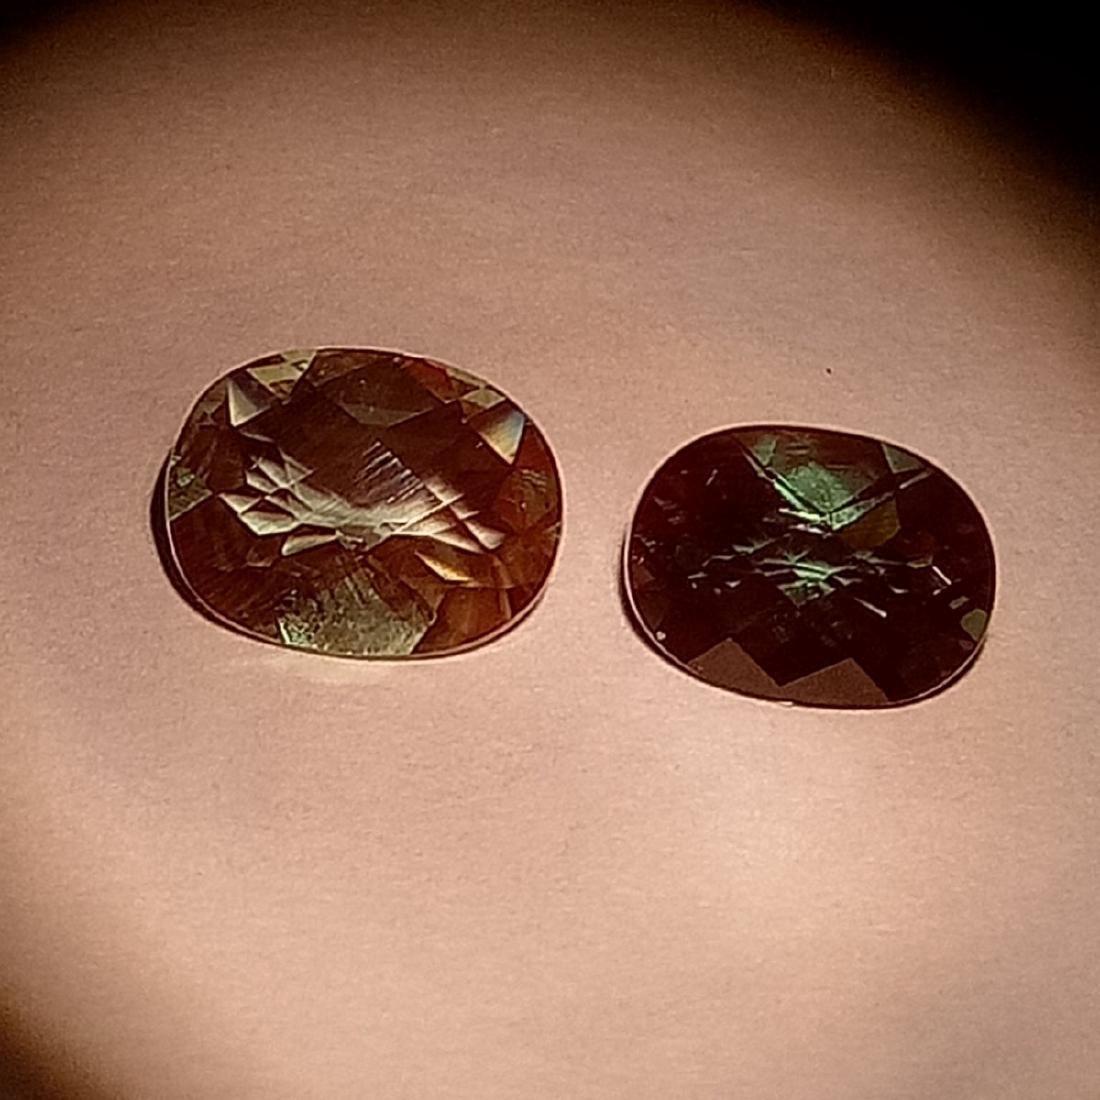 1.35 Carat Pair of Loose Color Change Andesine - 2